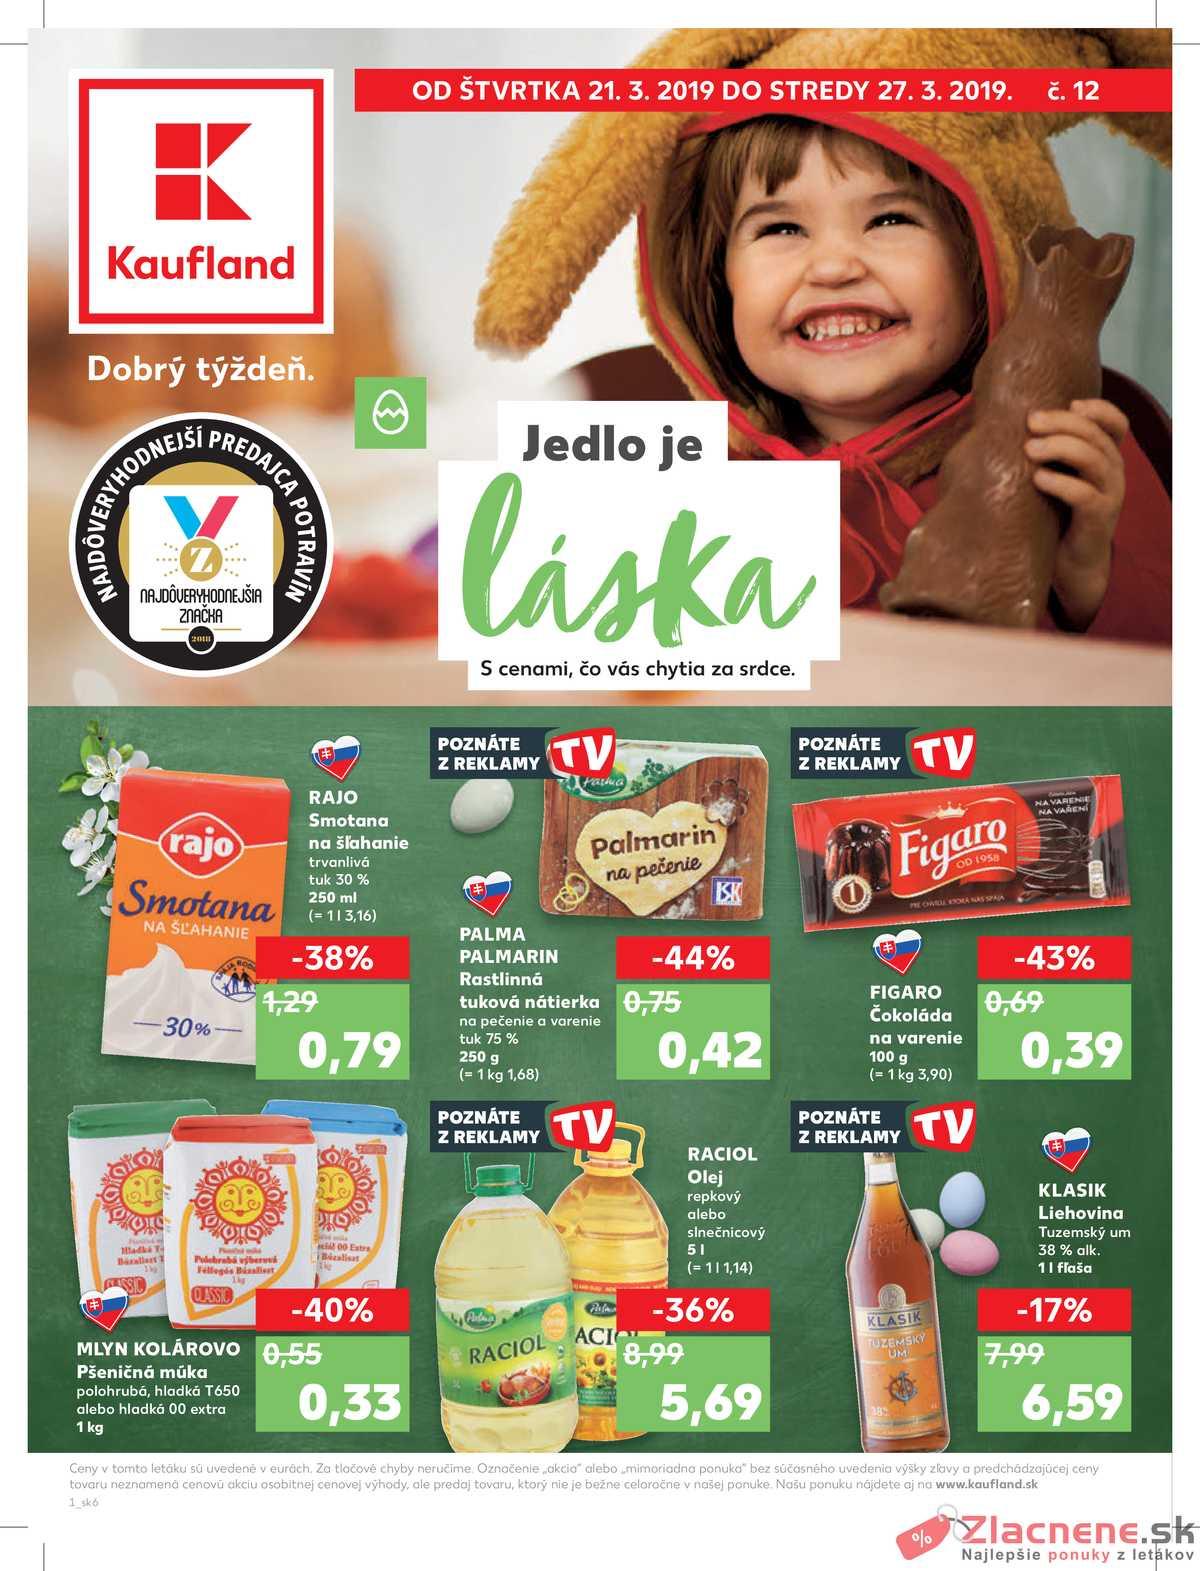 d6045b255 Leták Kaufland - Kaufland 21.3. - 27.3. - Kaufland Košice - Popradská -  strana